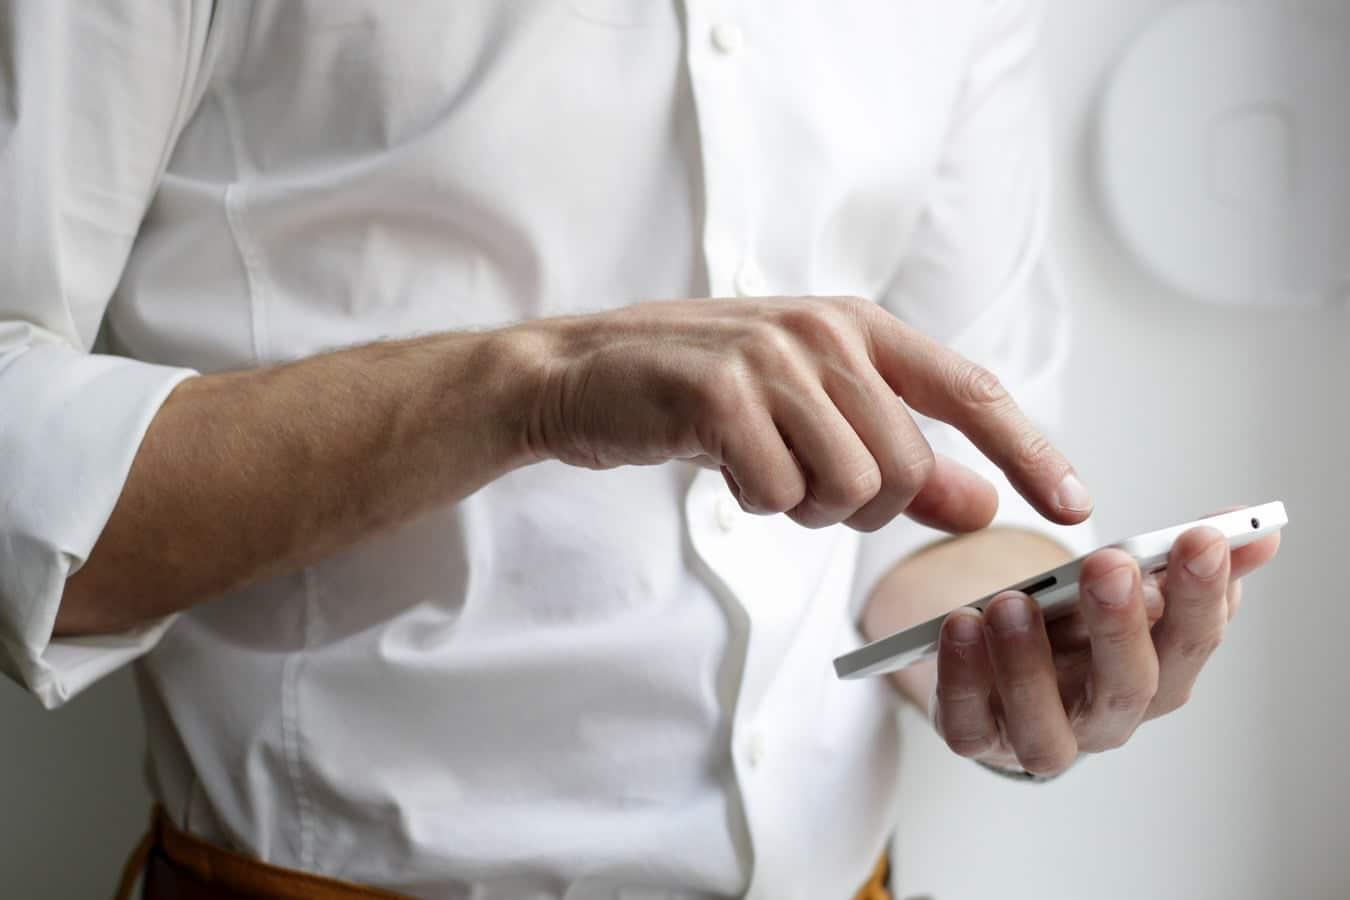 Man wearing a white shirt using his phone